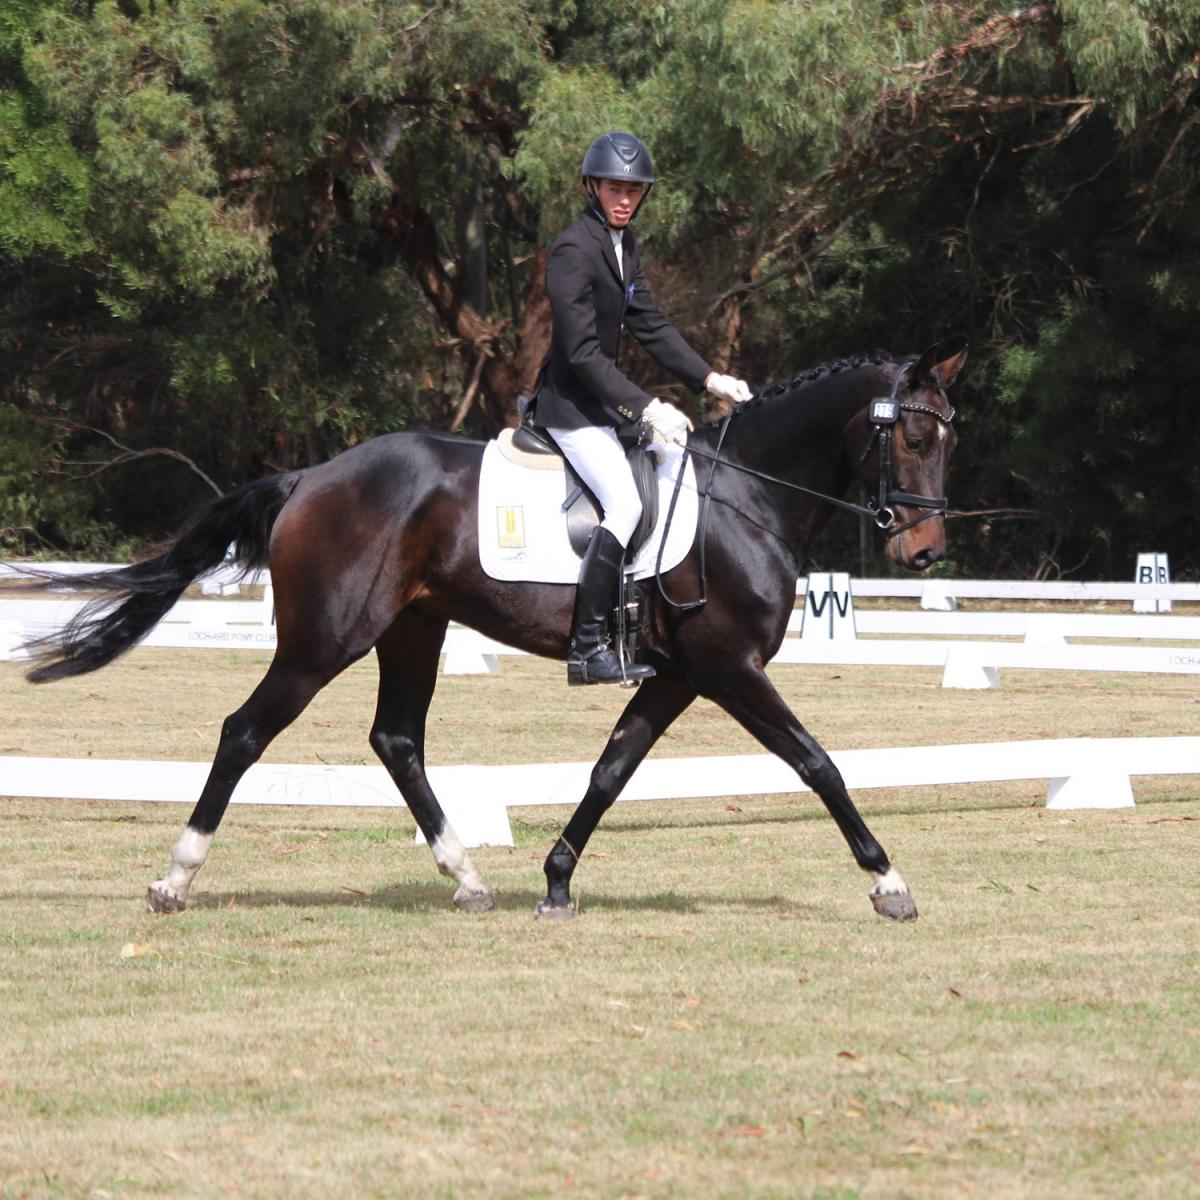 Sam Jeffree and Wimborne Conjuror at Heytesbury Horse Trials 2018